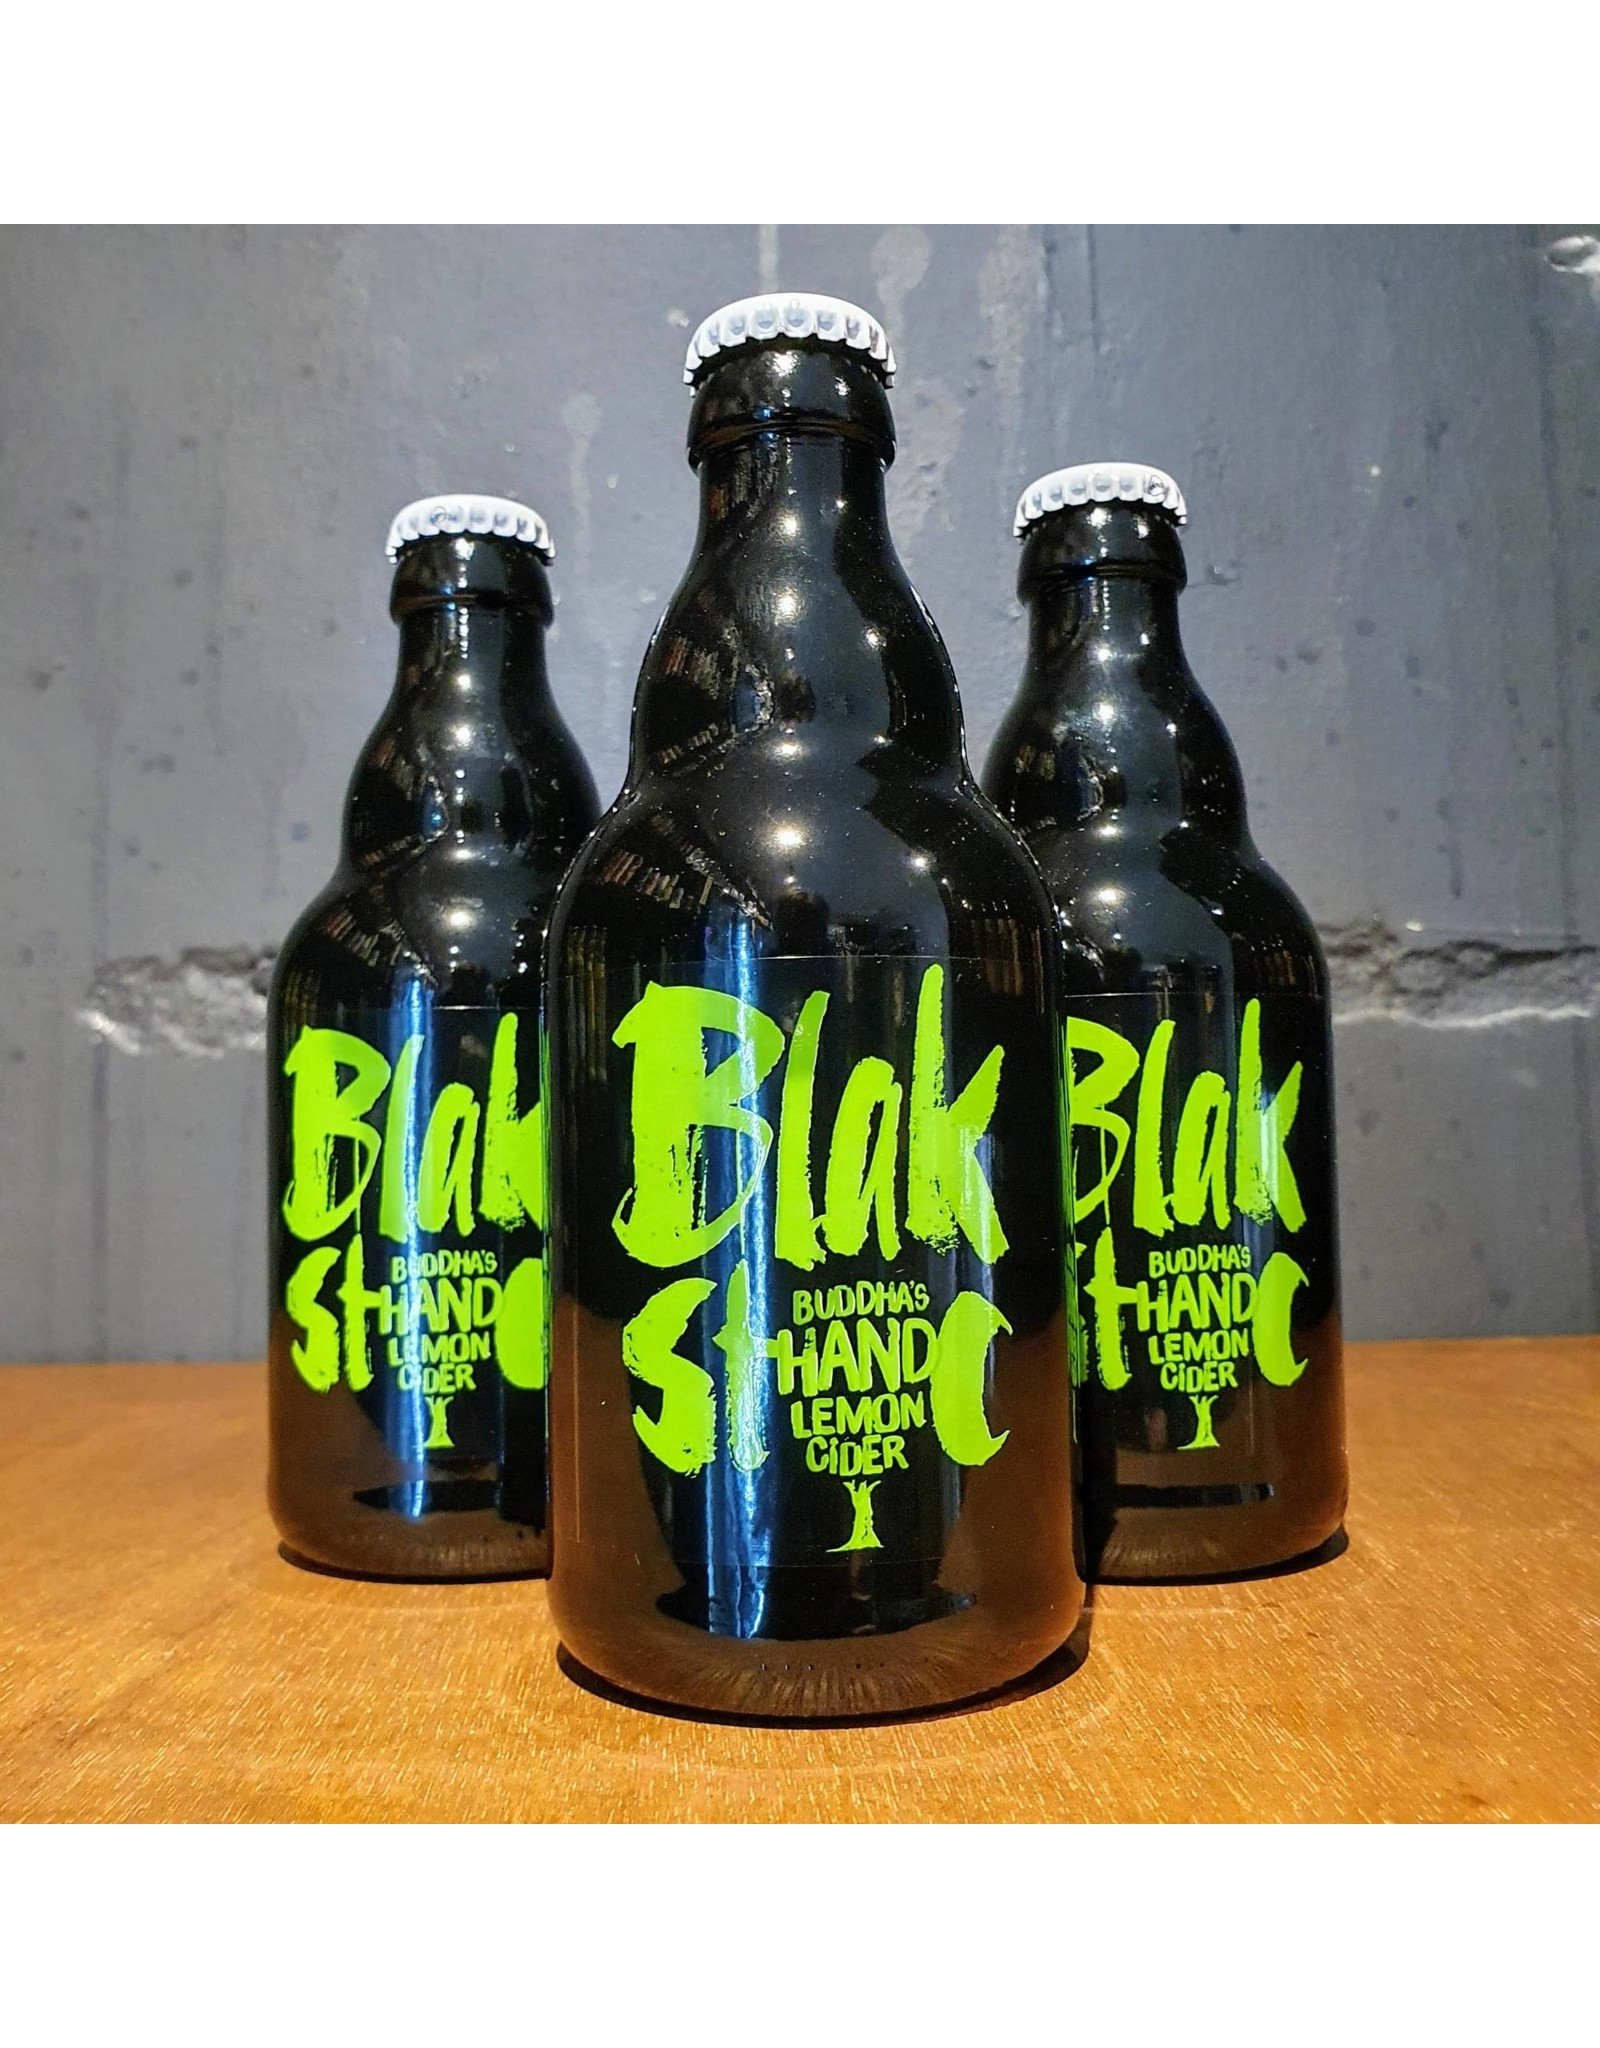 Blakstoc: Buddha's Hand Lemon Cider